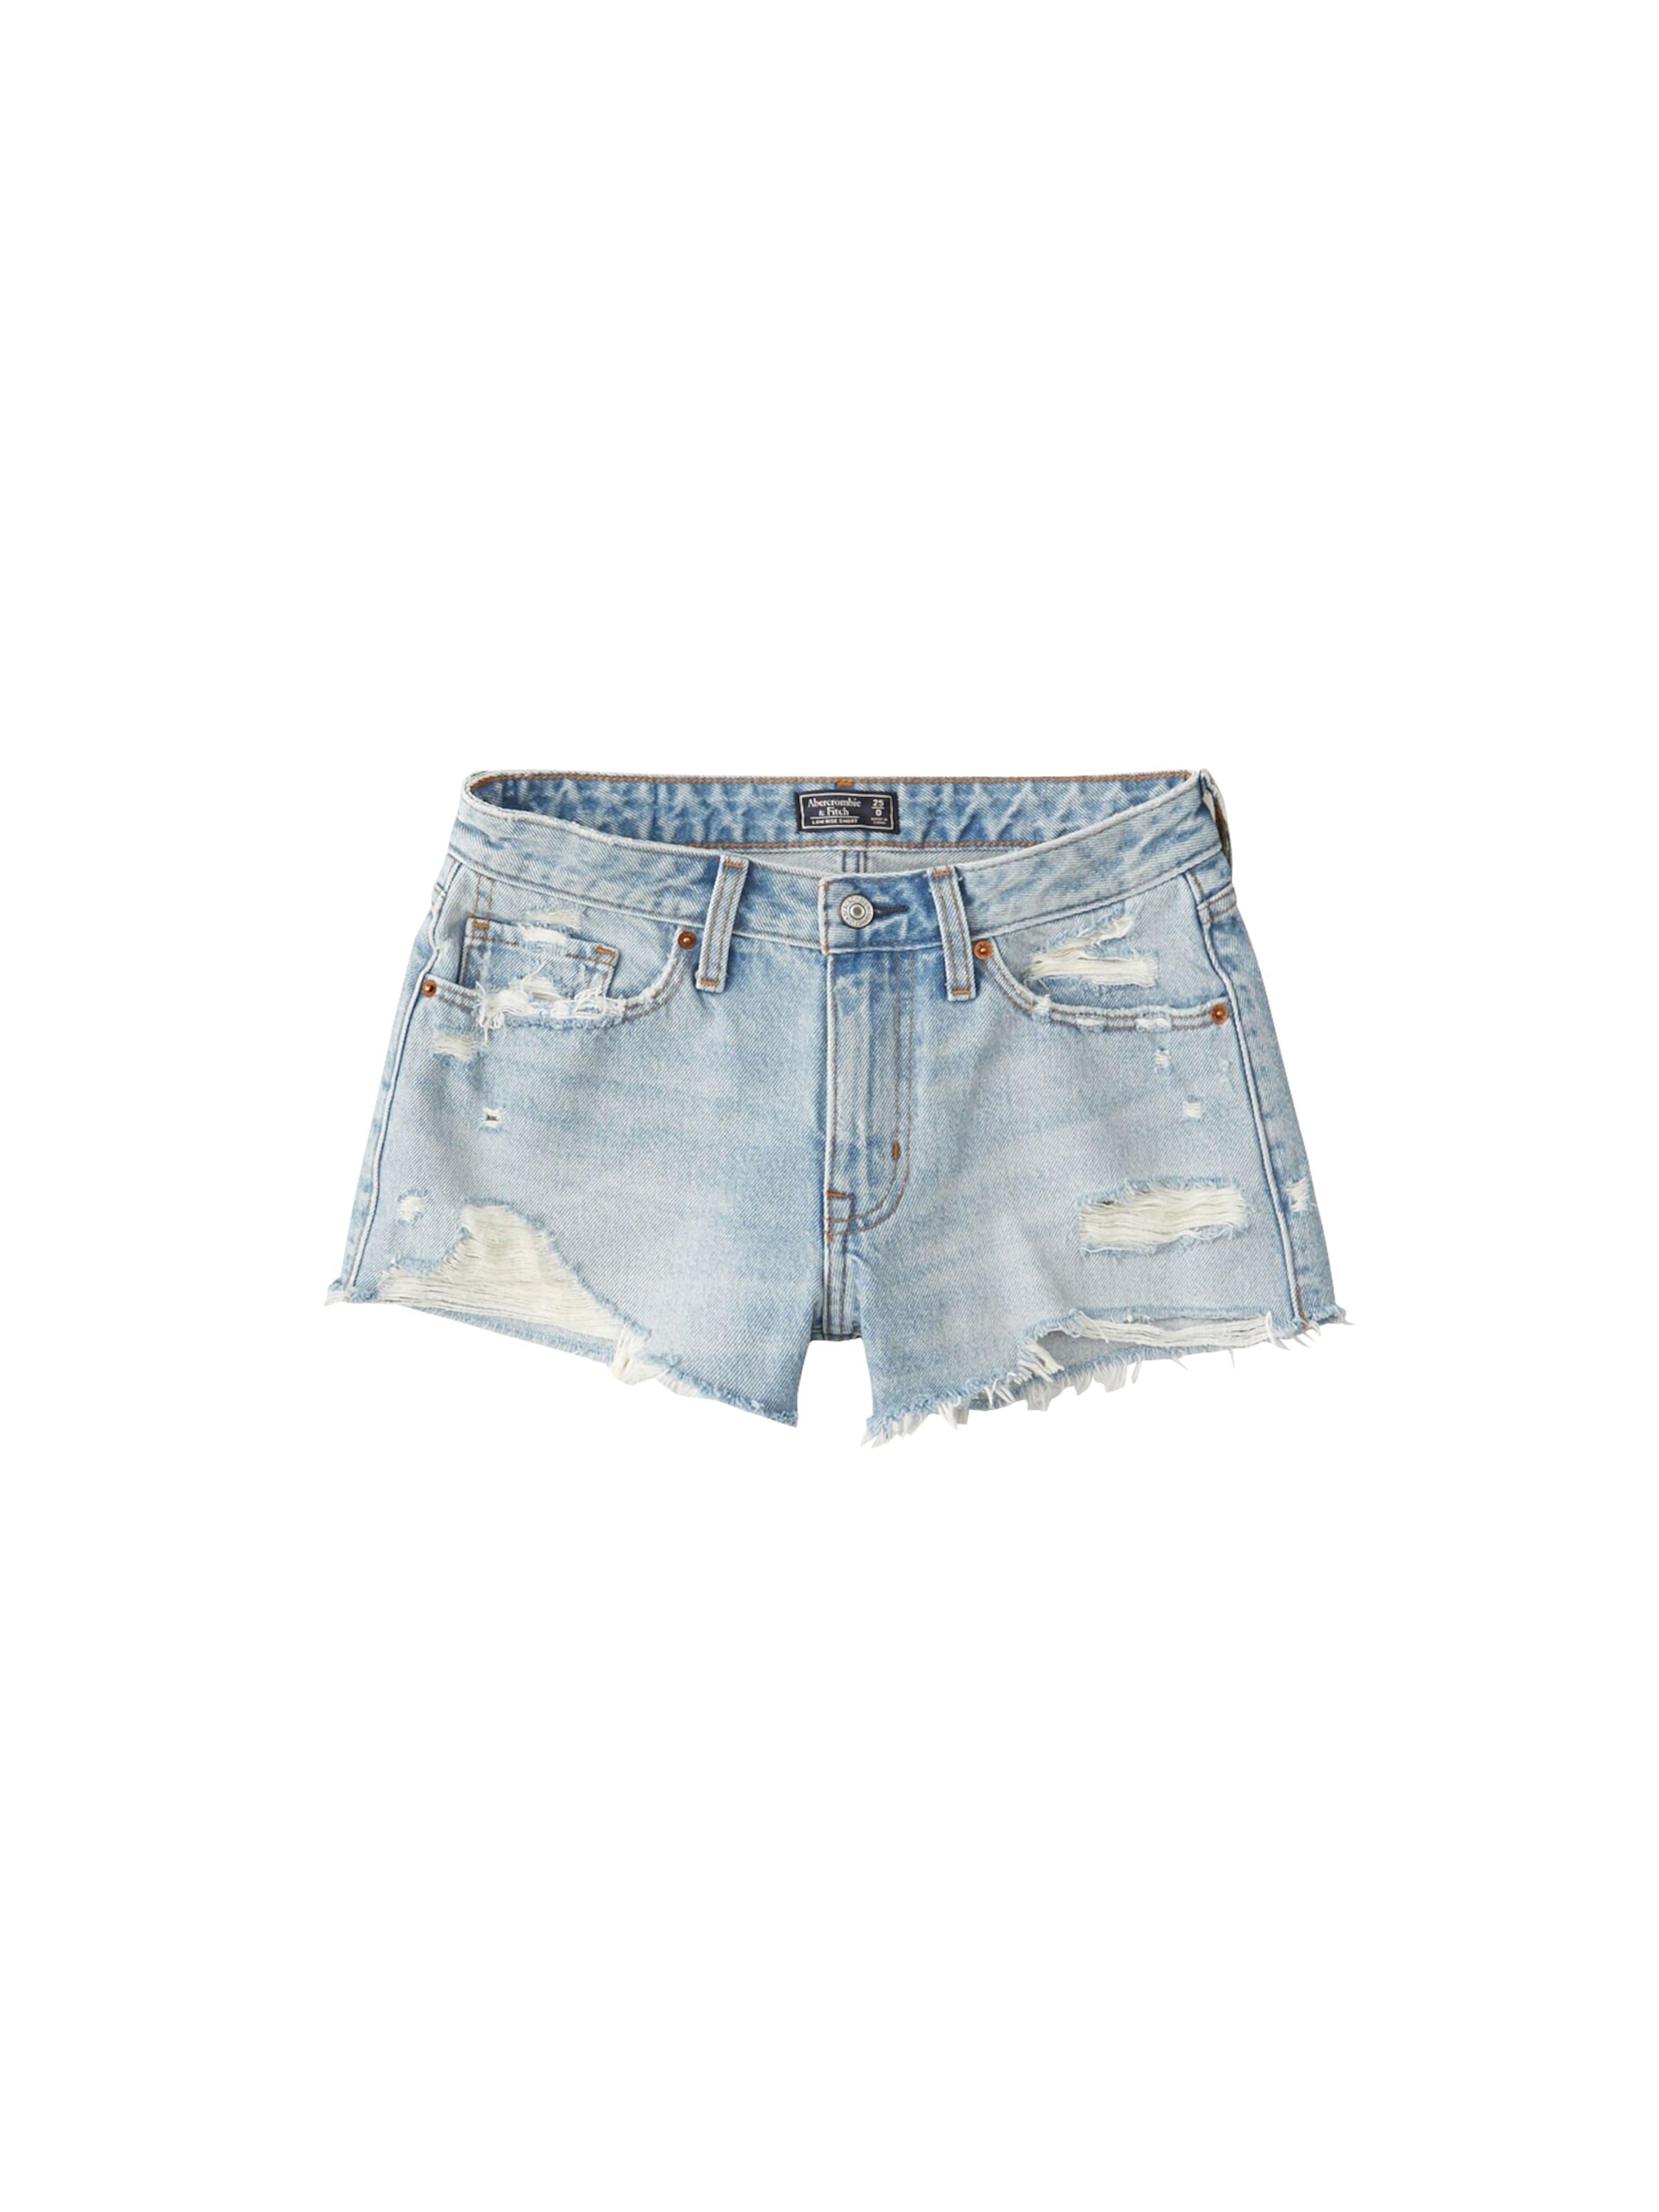 Denim Fitch In Shorts Abercrombieamp; Blue 7bvgIYymf6